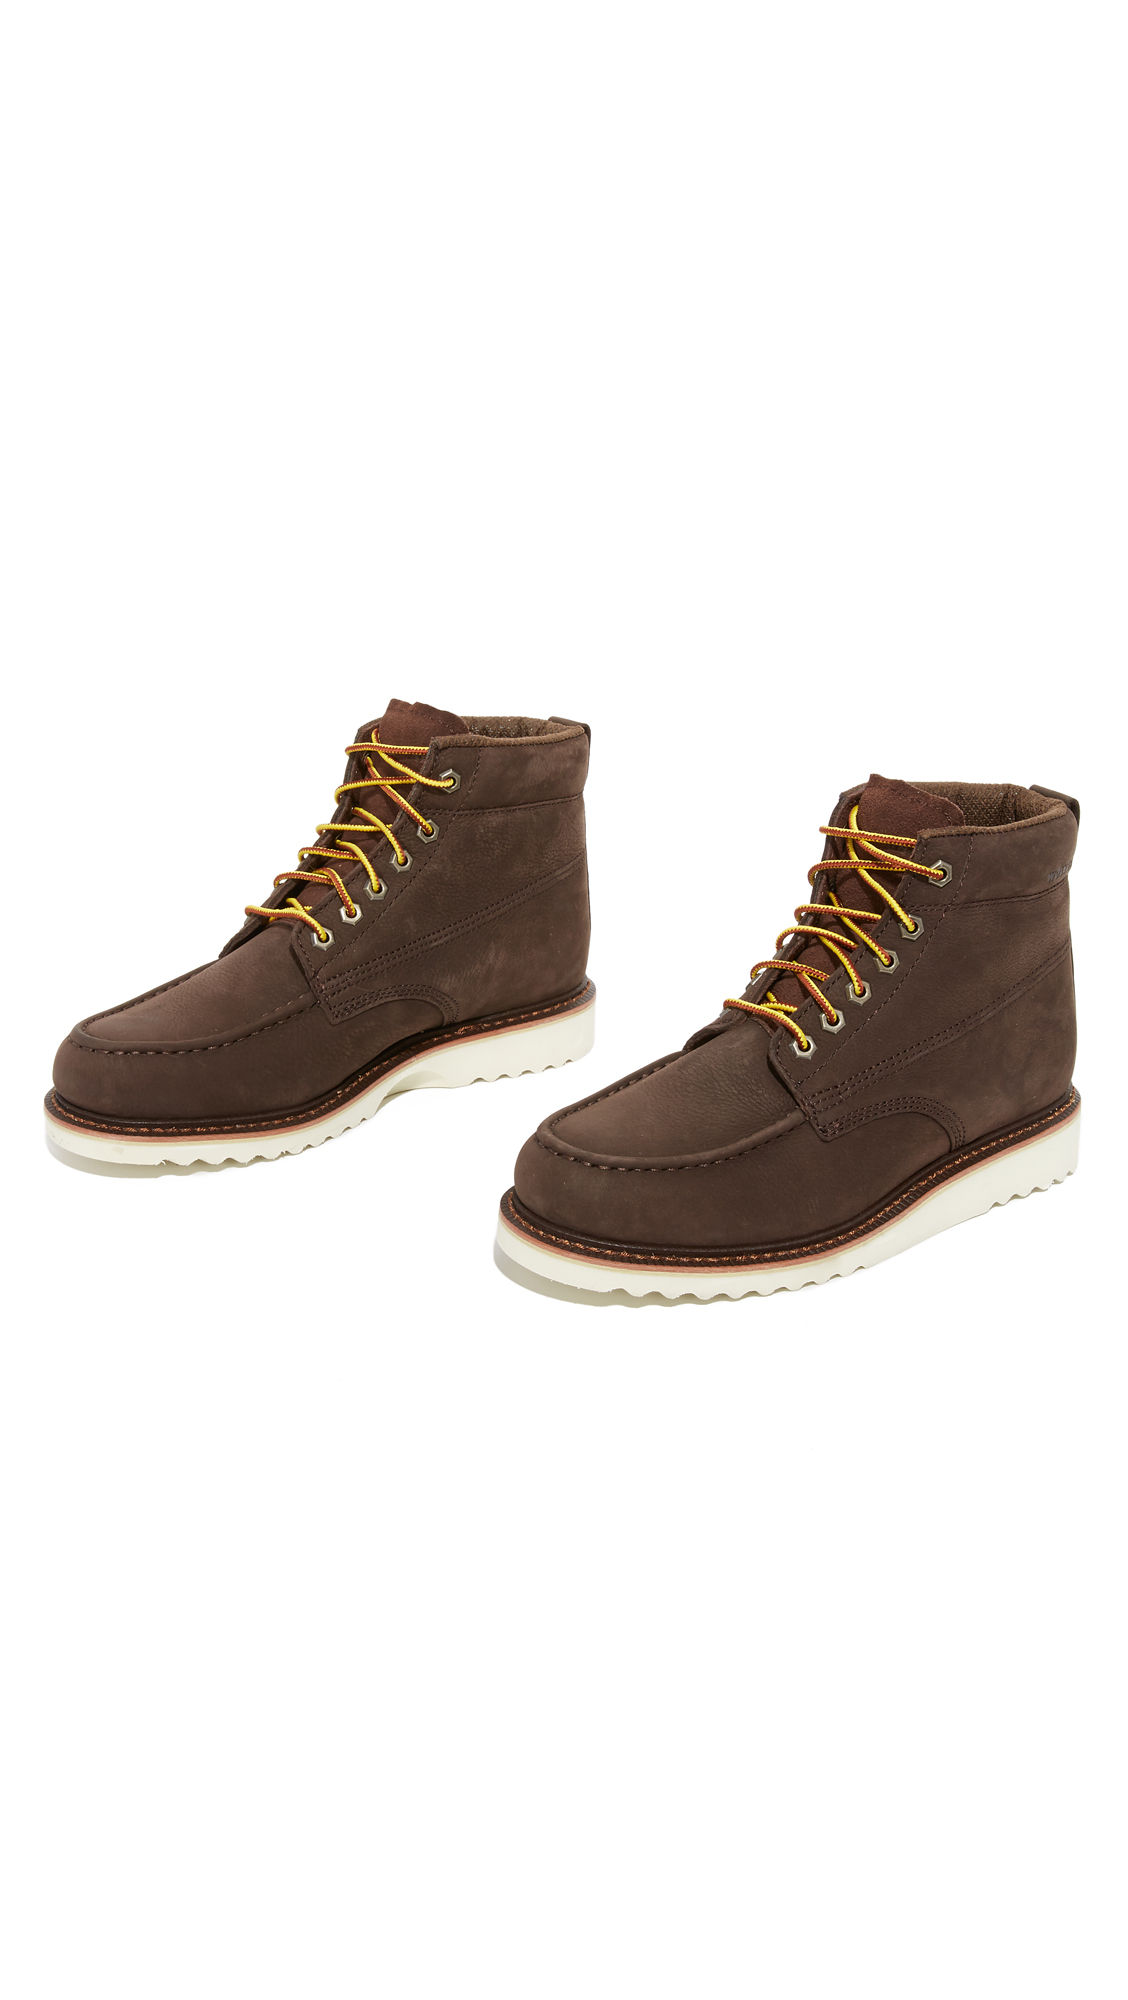 55e88f36ee4 Wolverine 1883 Ranger Moc Toe Boots | EAST DANE